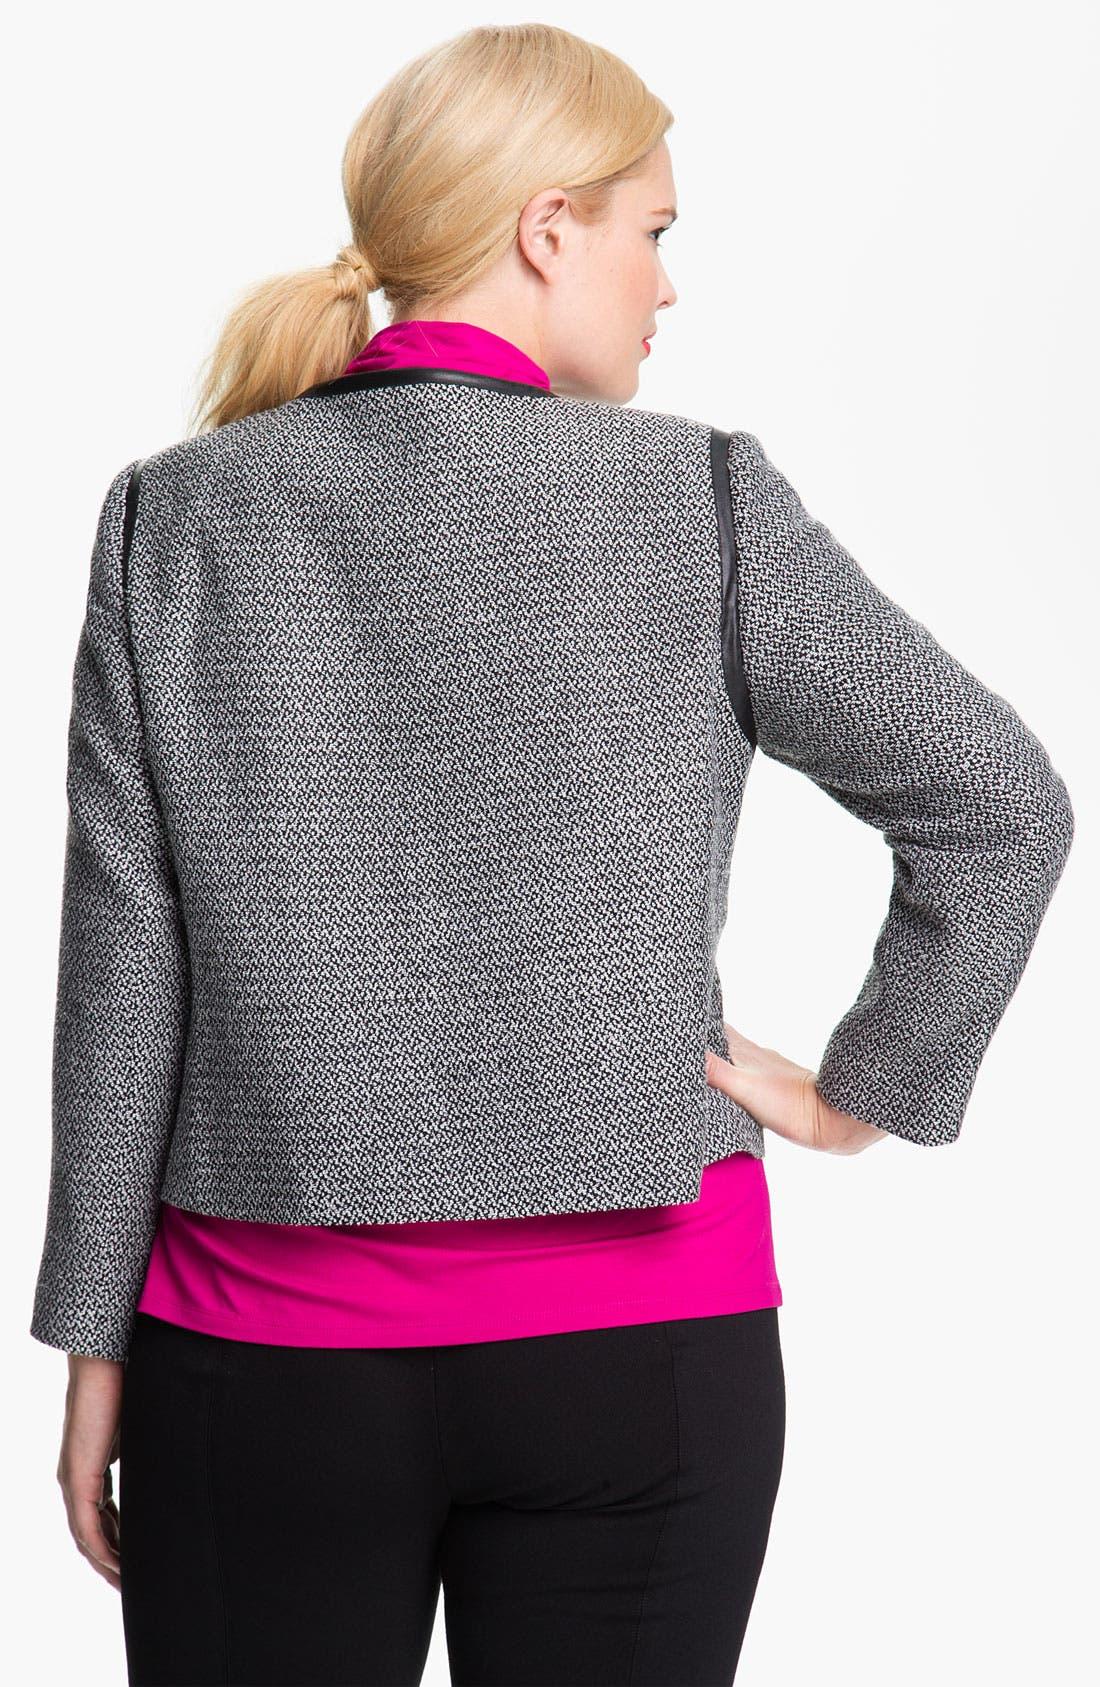 Alternate Image 2  - Vince Camuto Faux Leather Trim Tweed Jacket (Plus)